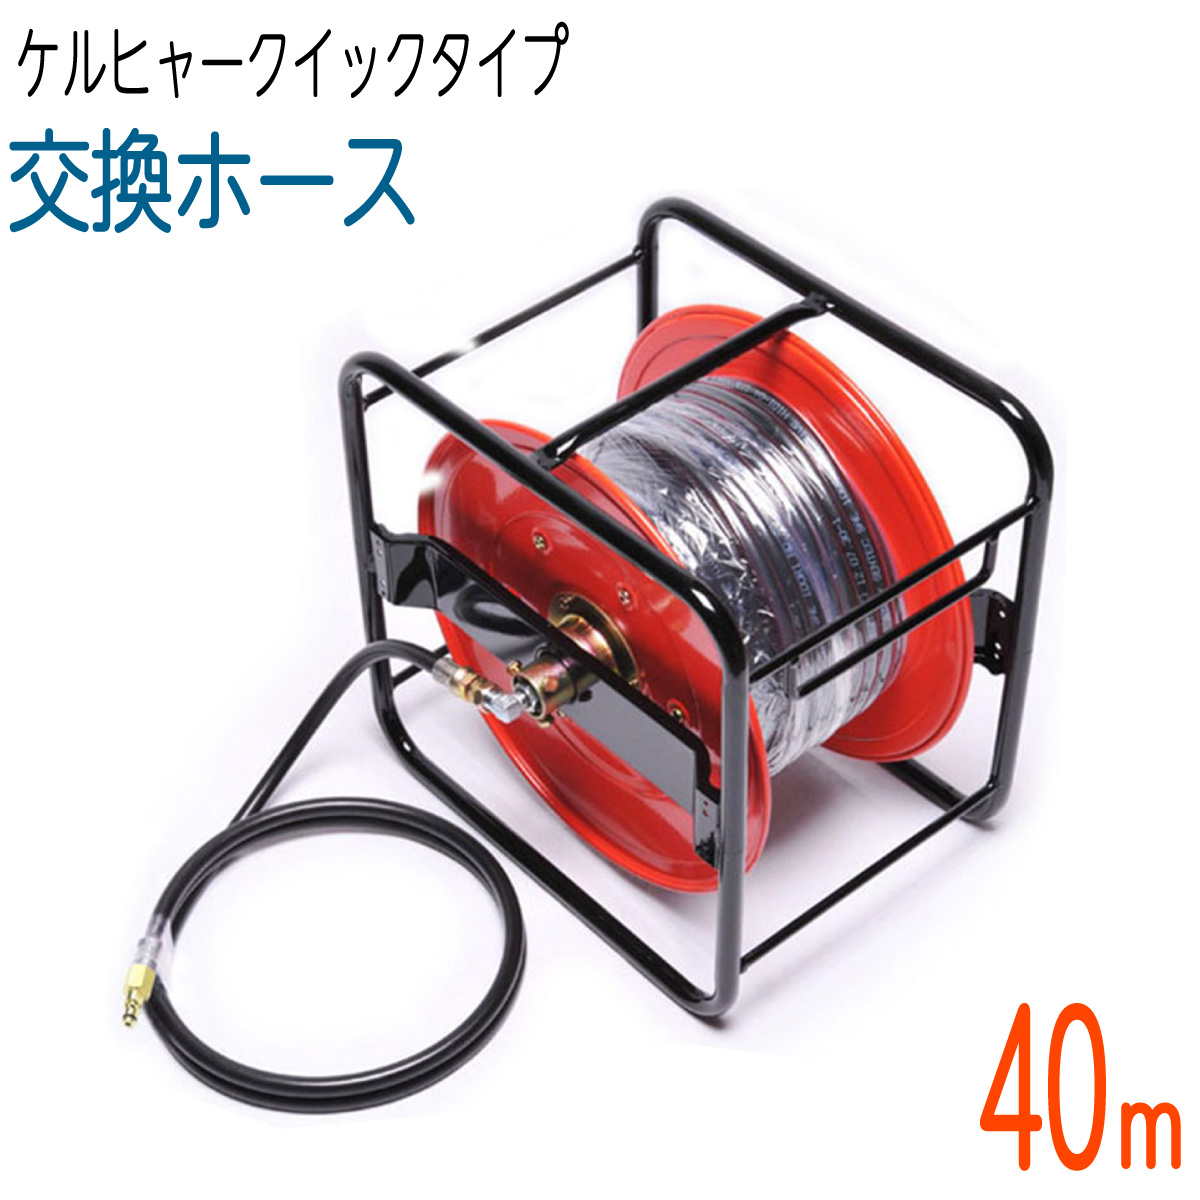 40Mリール巻き ケルヒャー互換交換用 両端クイックタイプ 高圧洗浄機ホース 片側スイベル付き 訳あり商品 流行のアイテム コンパクトホース